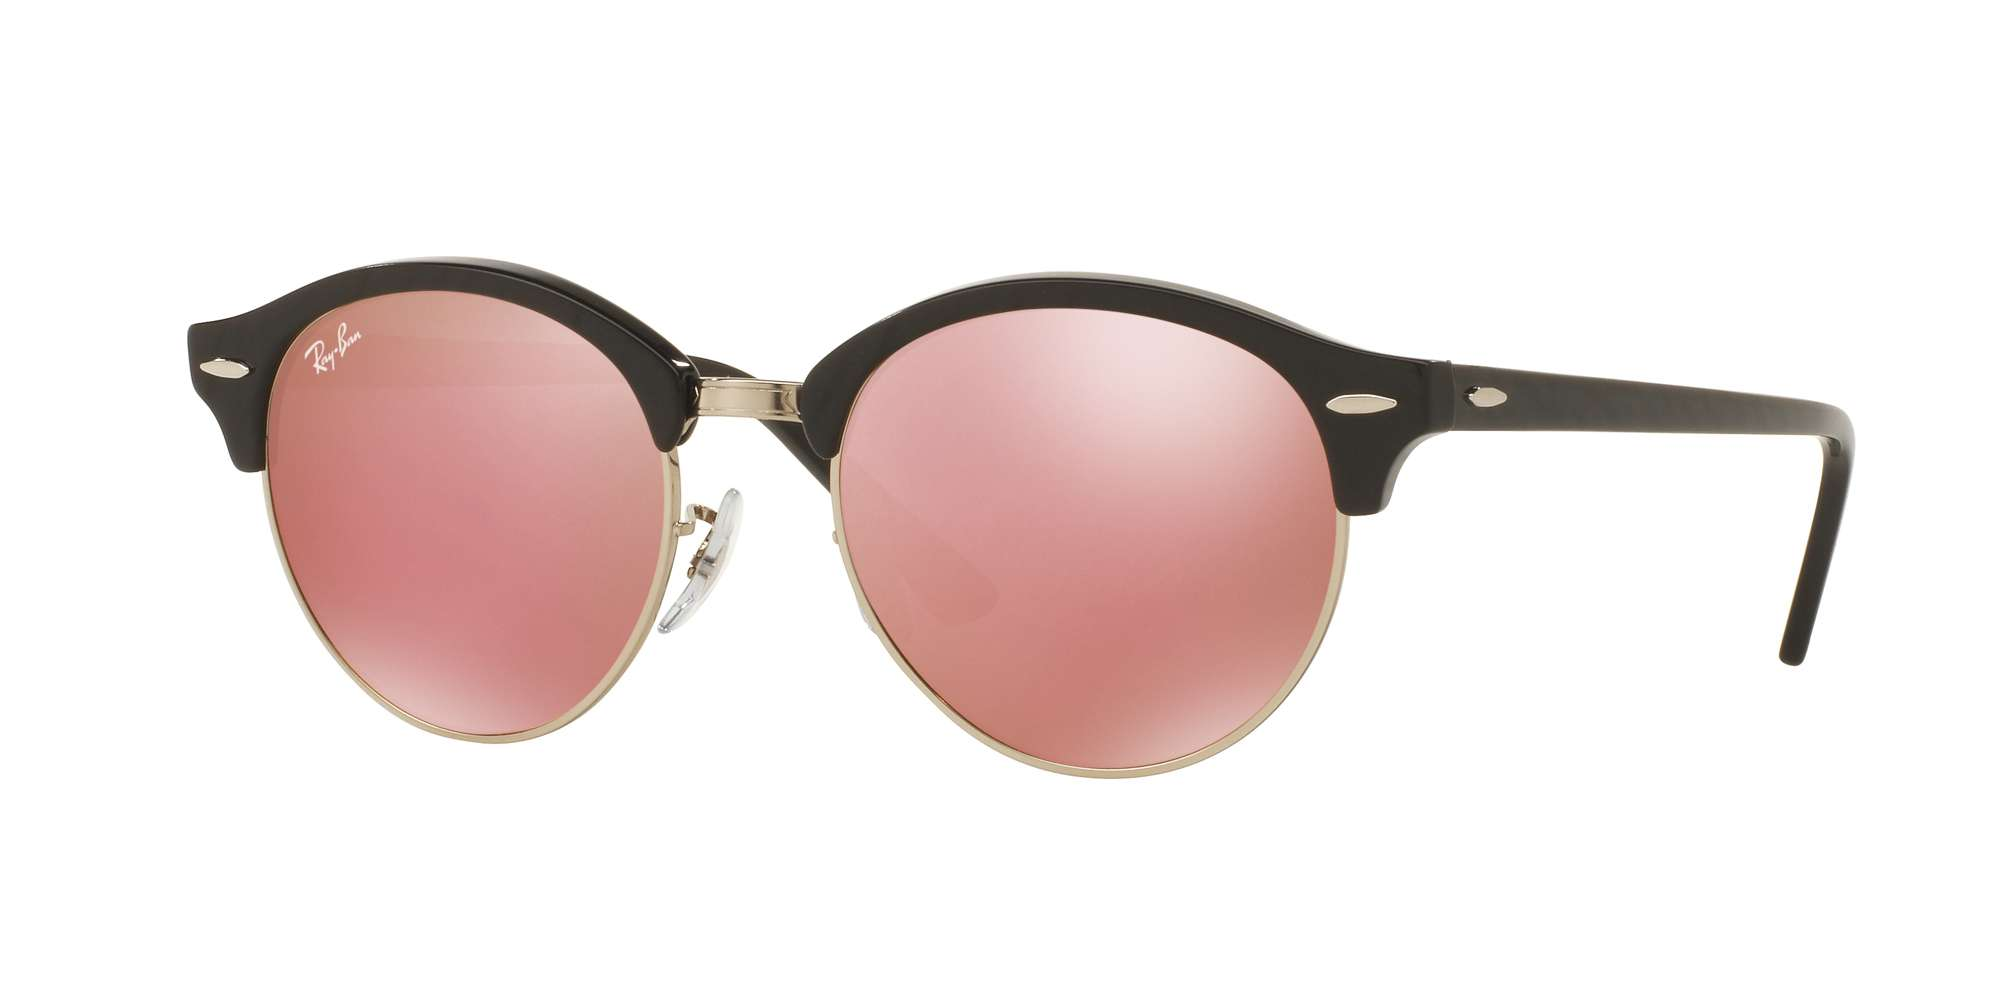 TOP WRINKLED BLACK ON BL / BROWN MIRROR PINK lenses